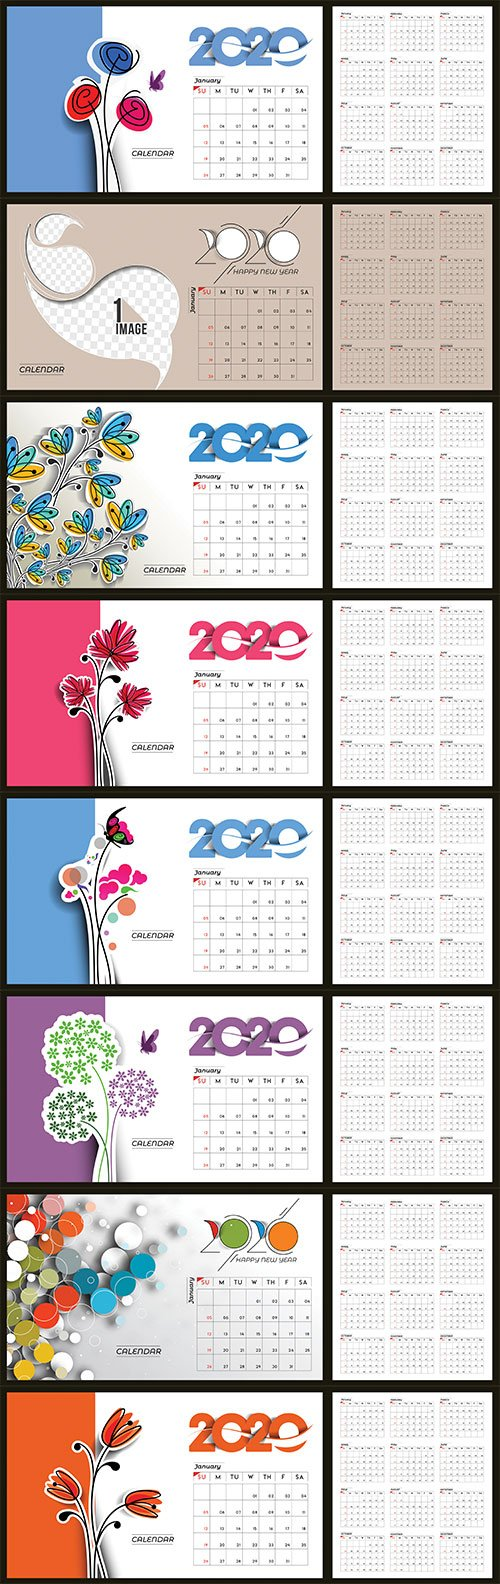 Happy new year 2020 Calendar # 5